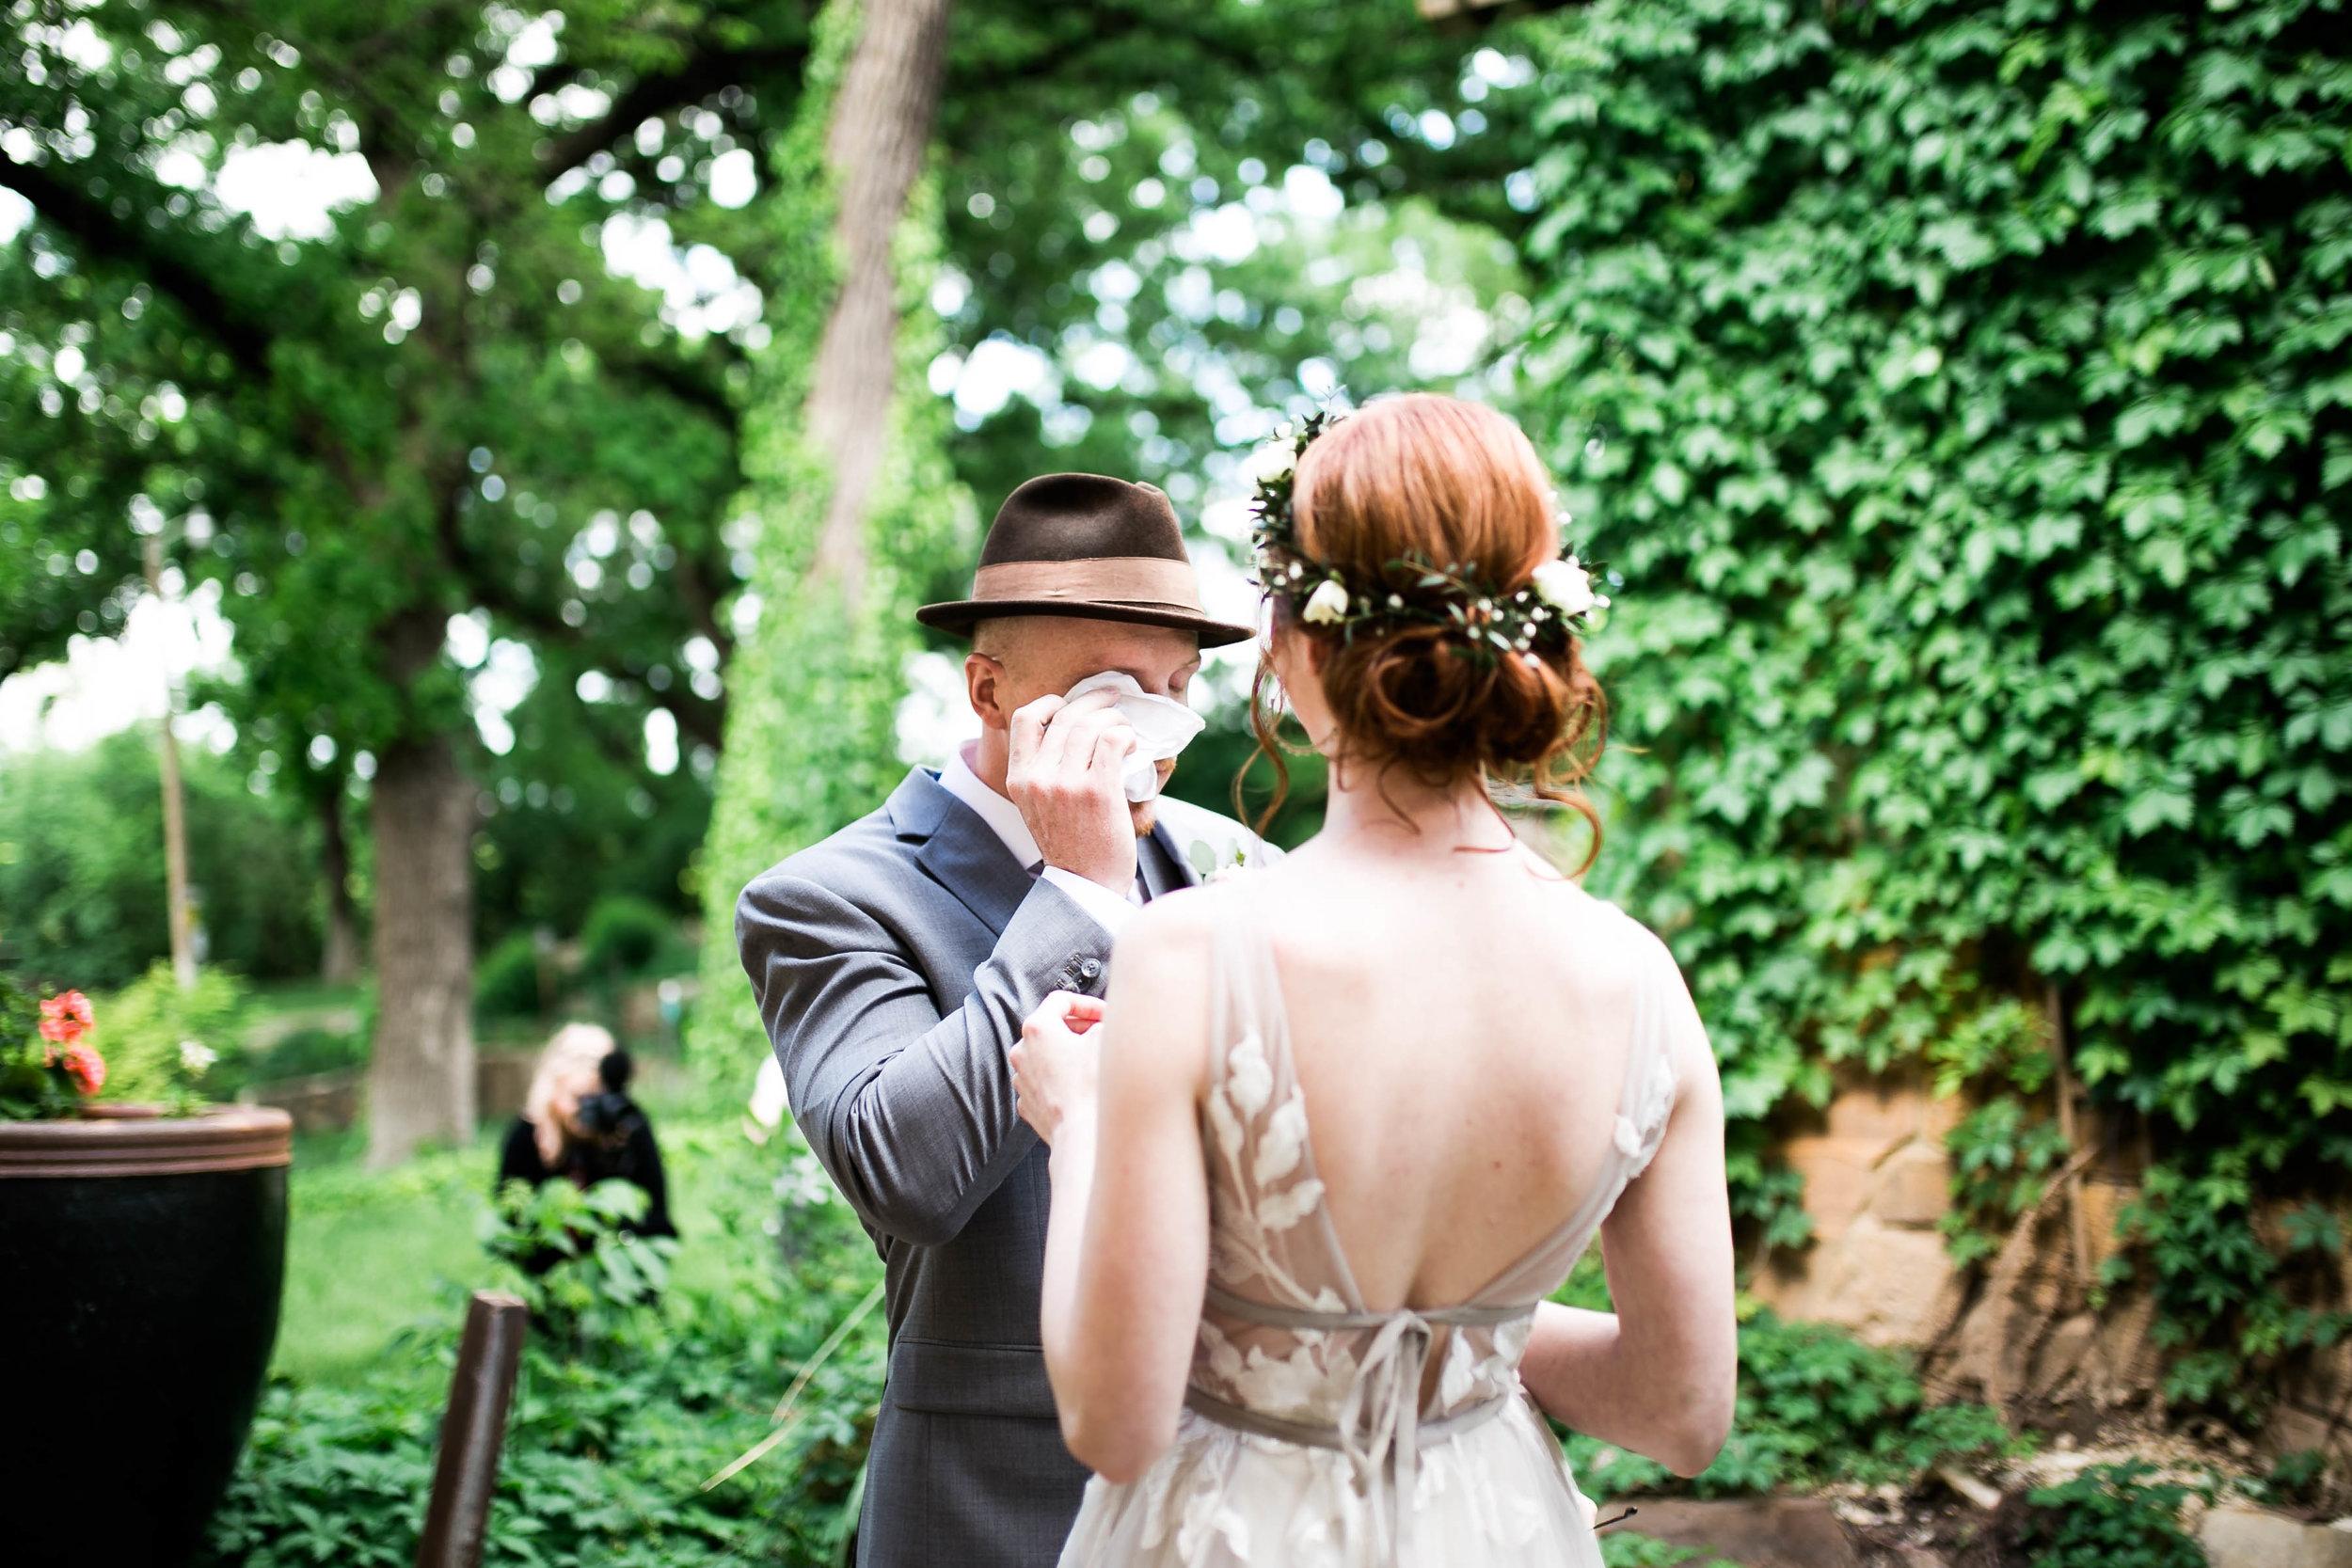 armstrong-wedding-162.jpg